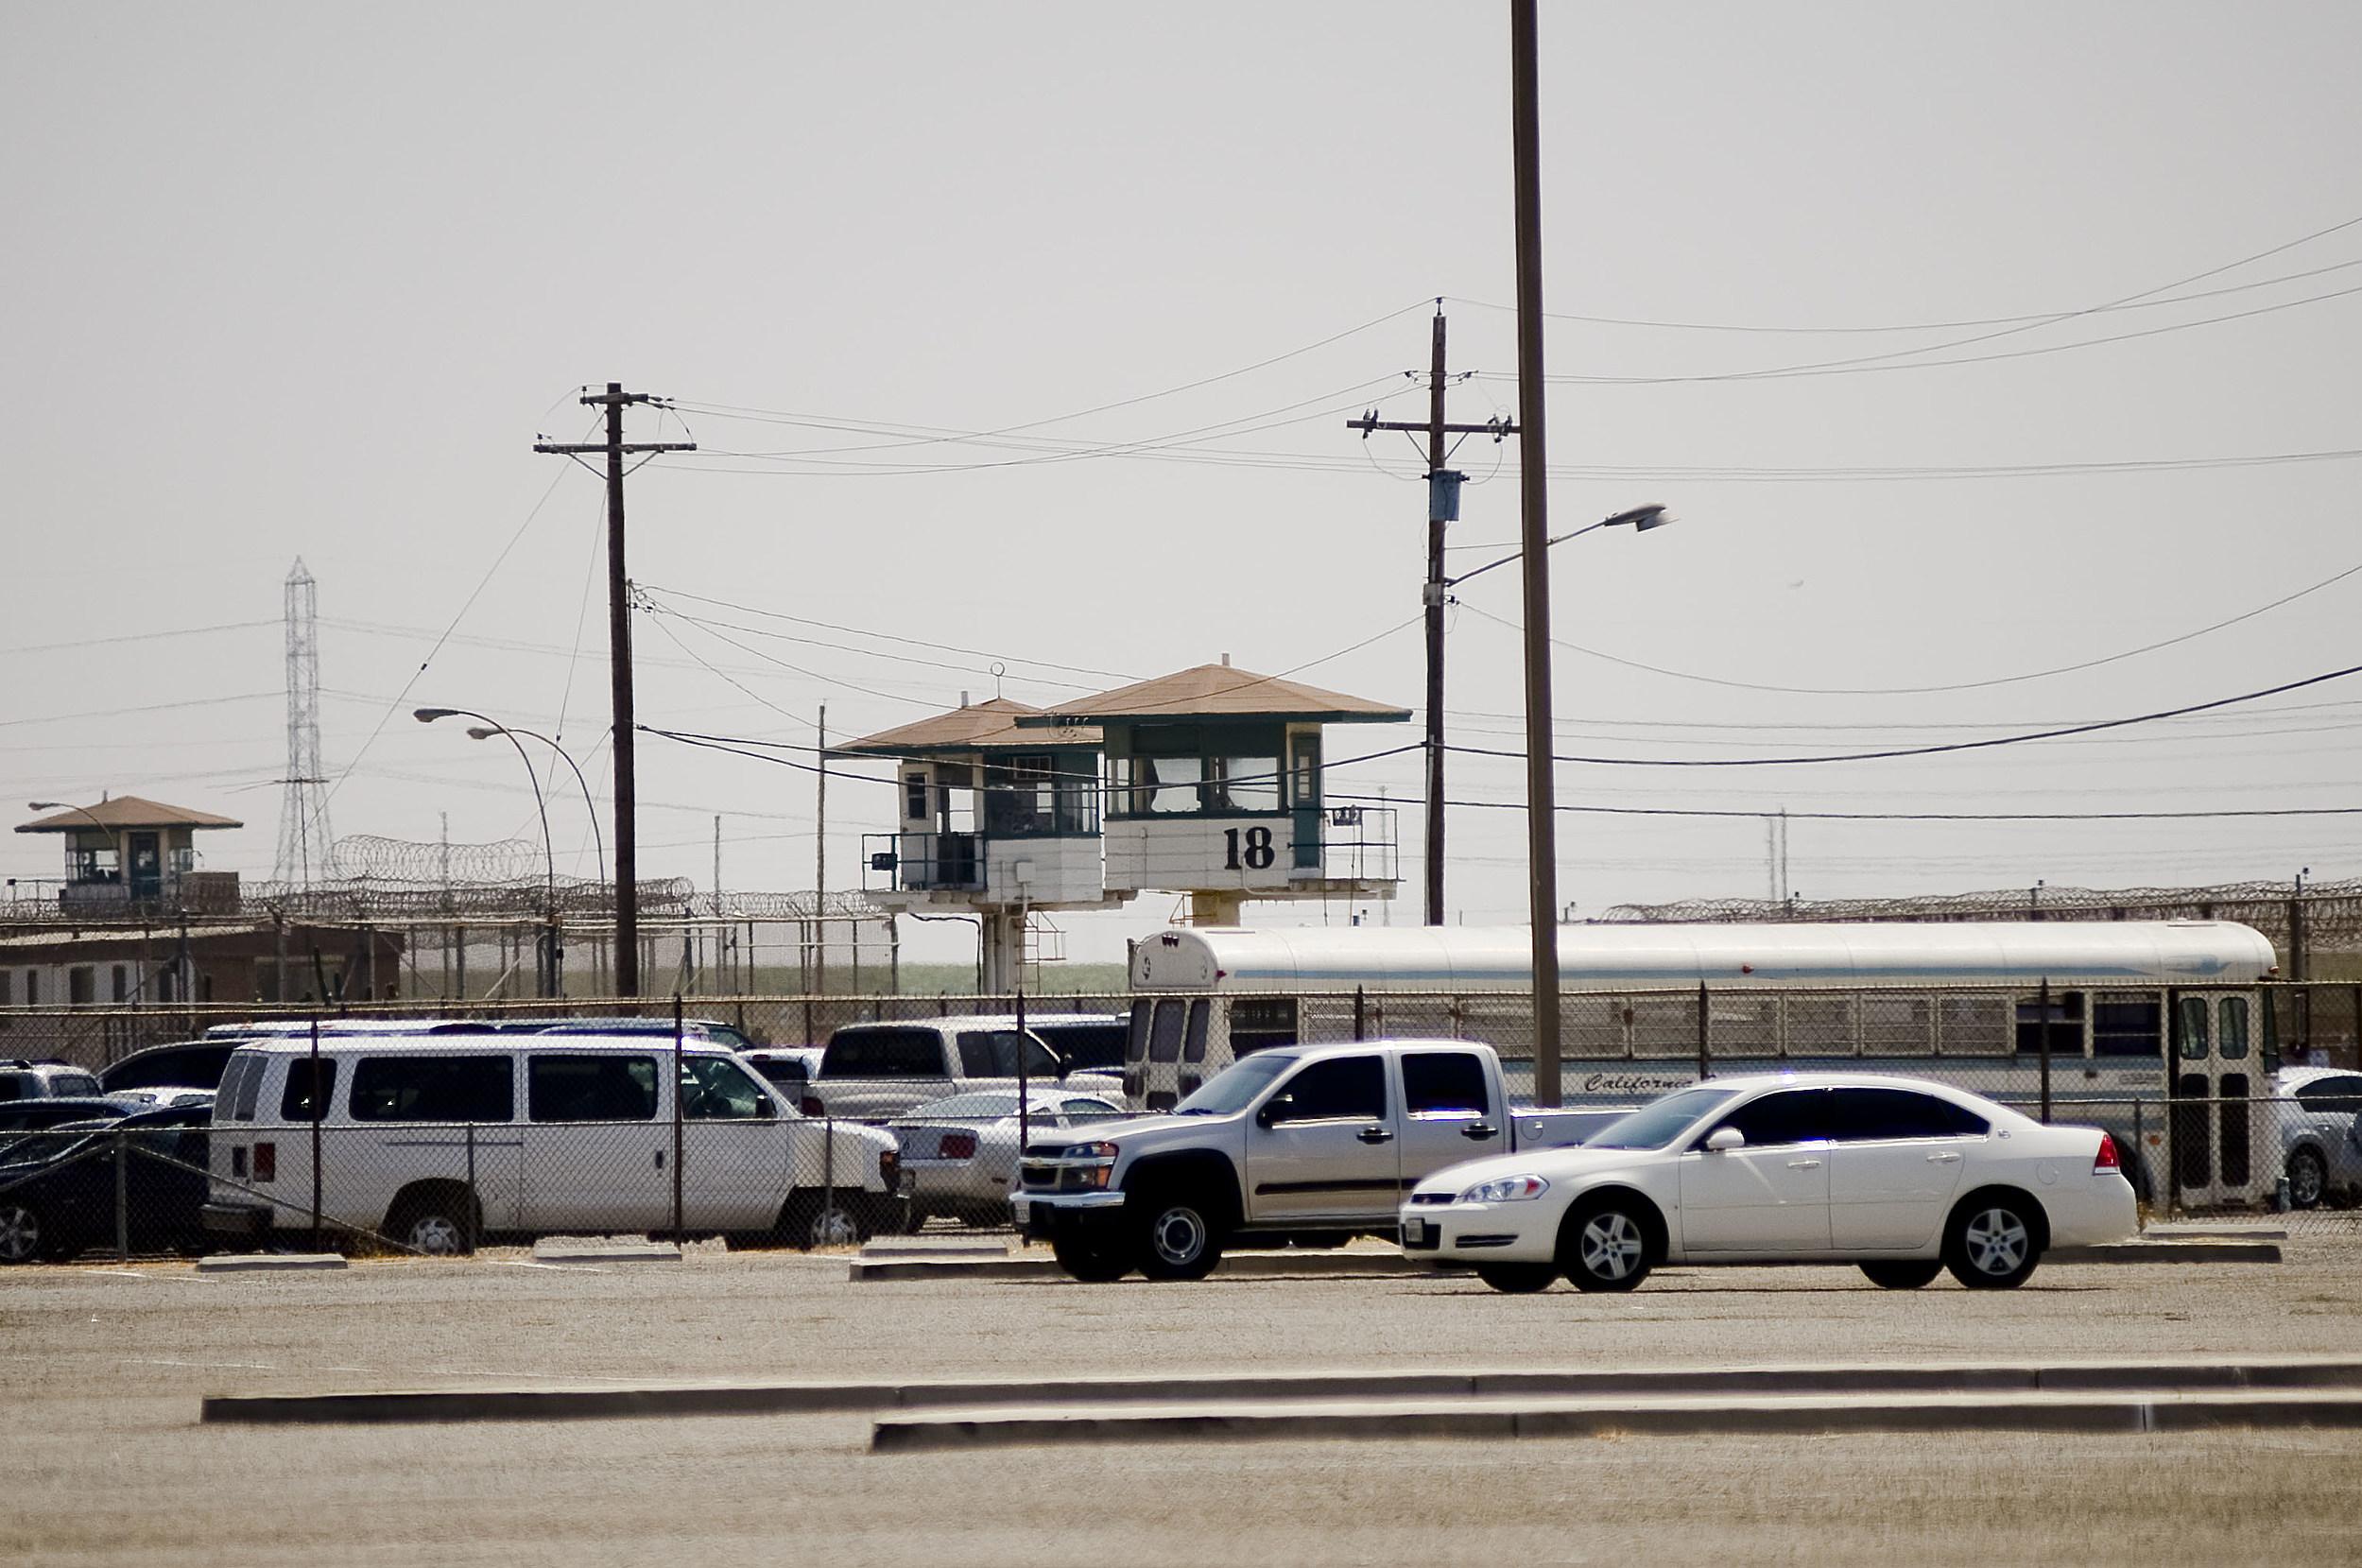 Governor Schwarzenegger Tours Prison Where Riot Took Place